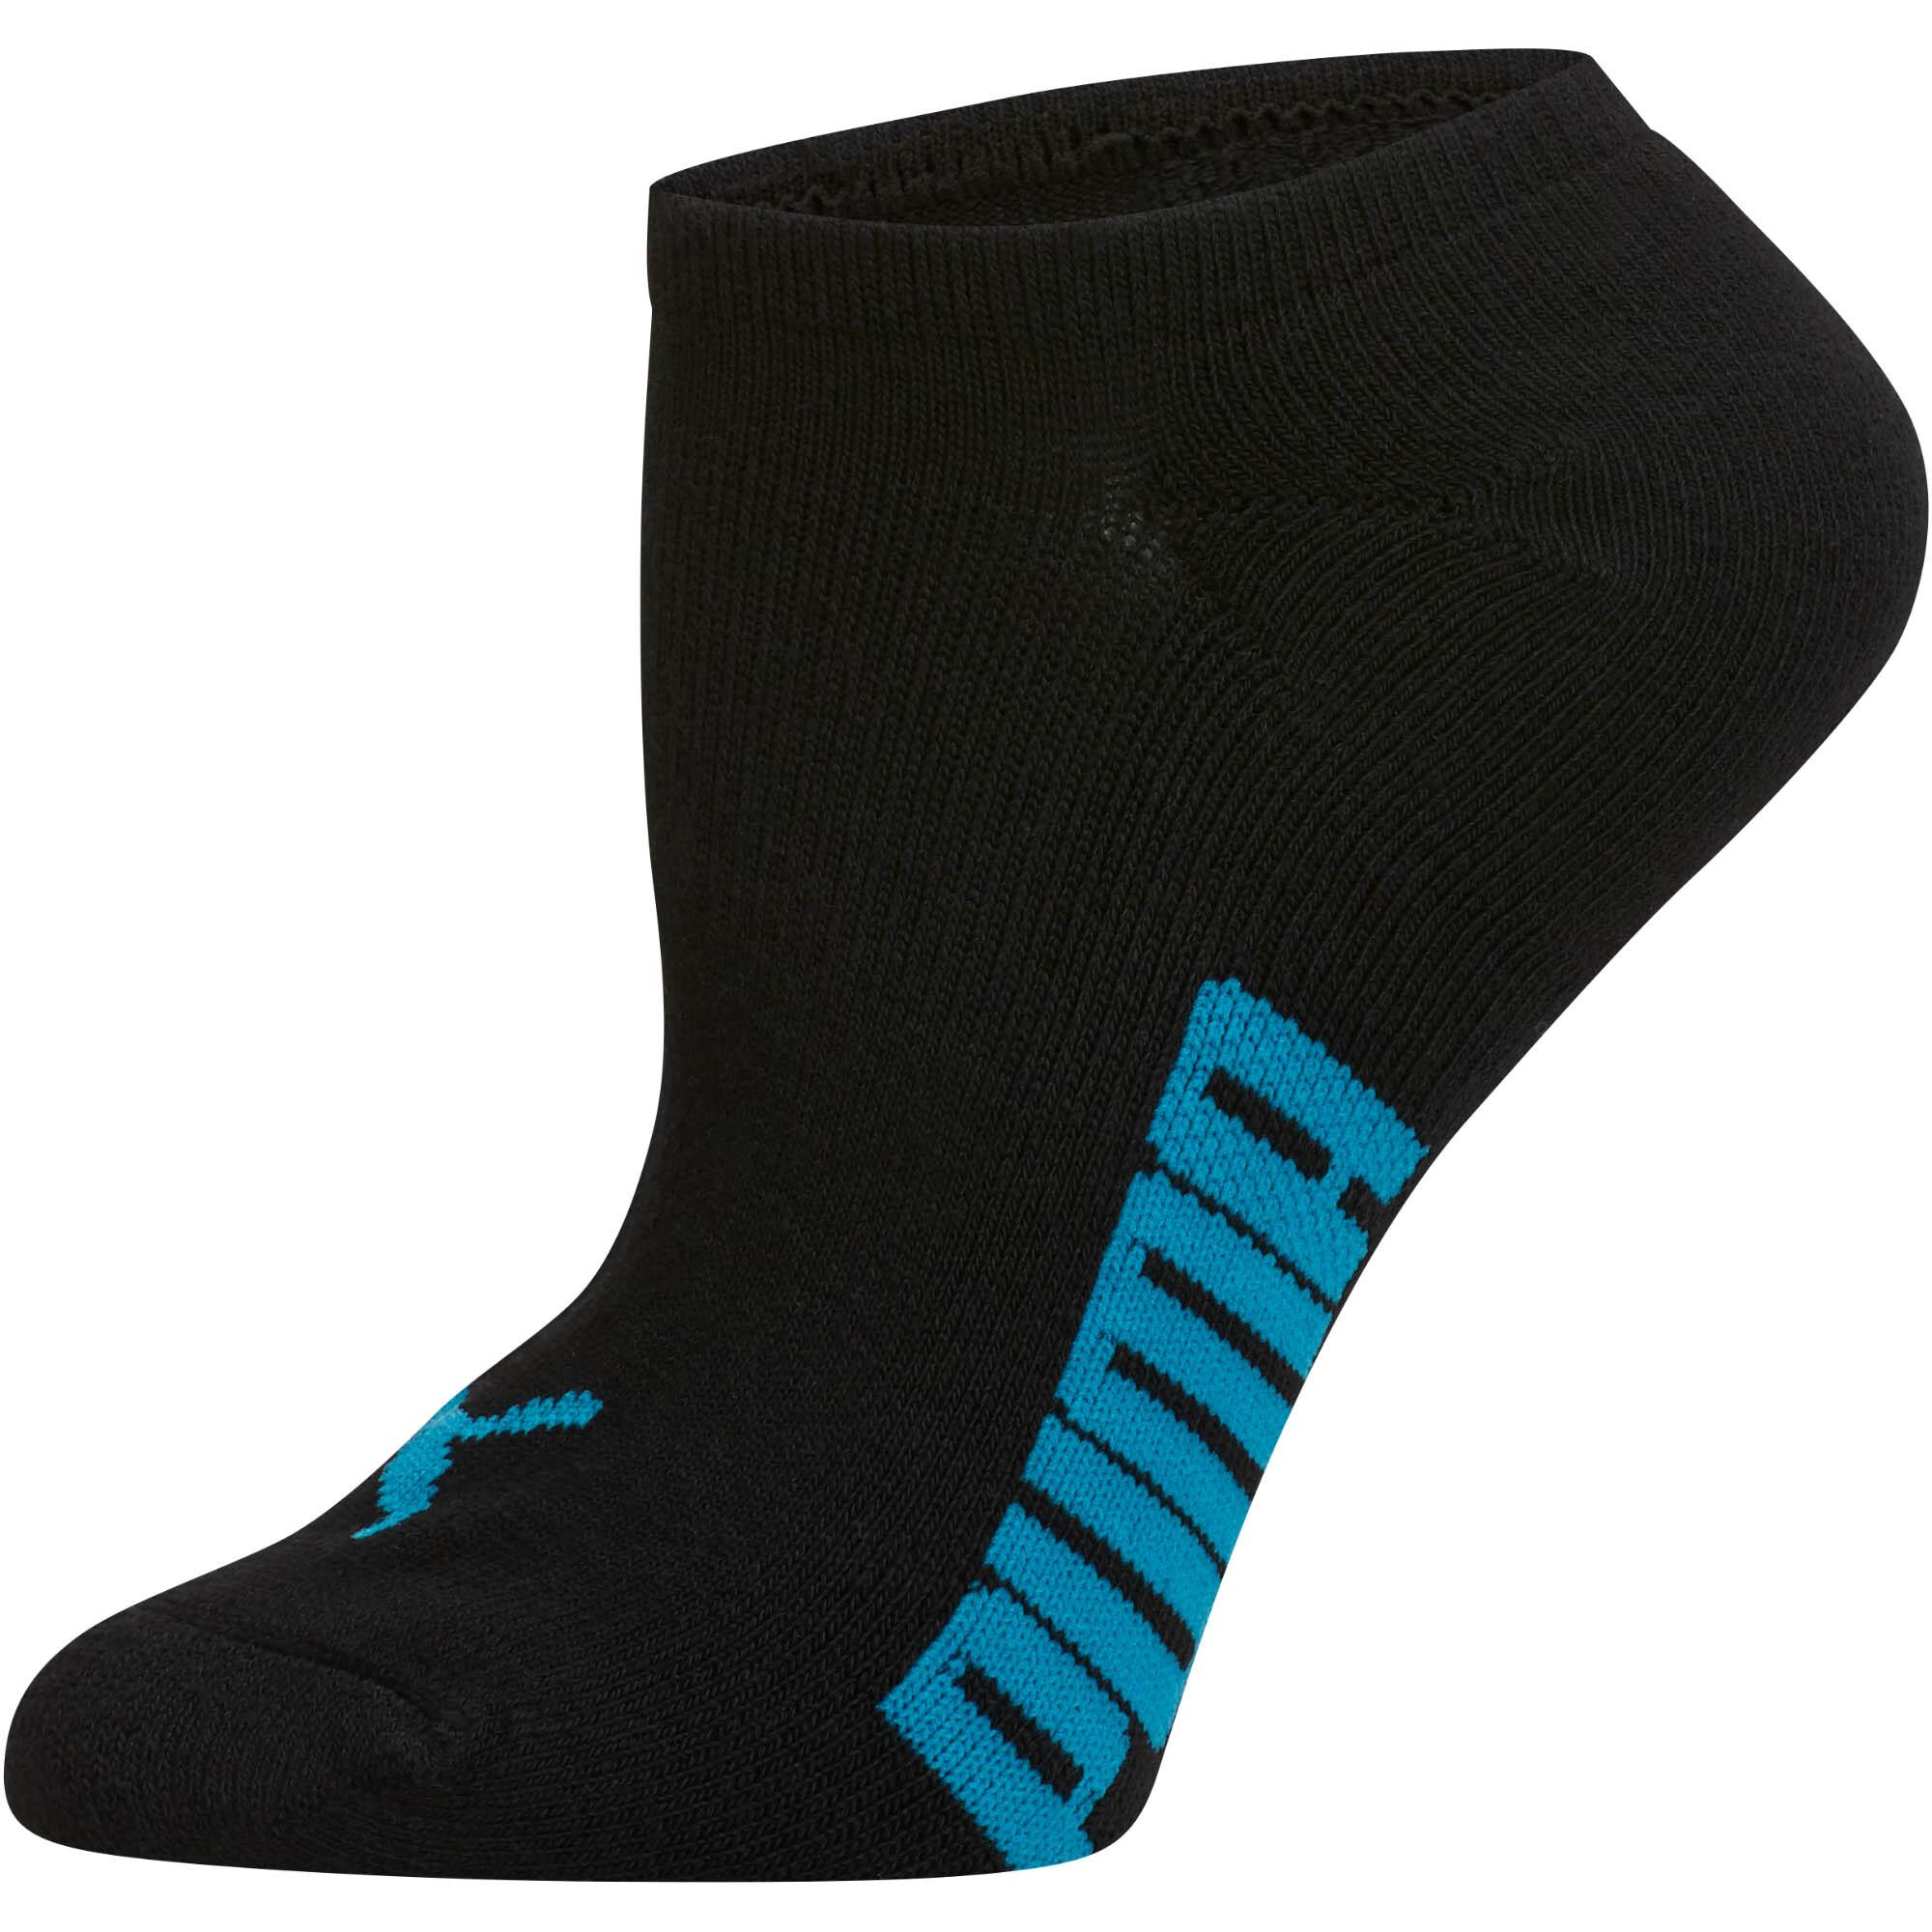 Licence-Women-s-Invisible-No-Show-Socks-3-Pack-Women-Socks-3-Pack thumbnail 13